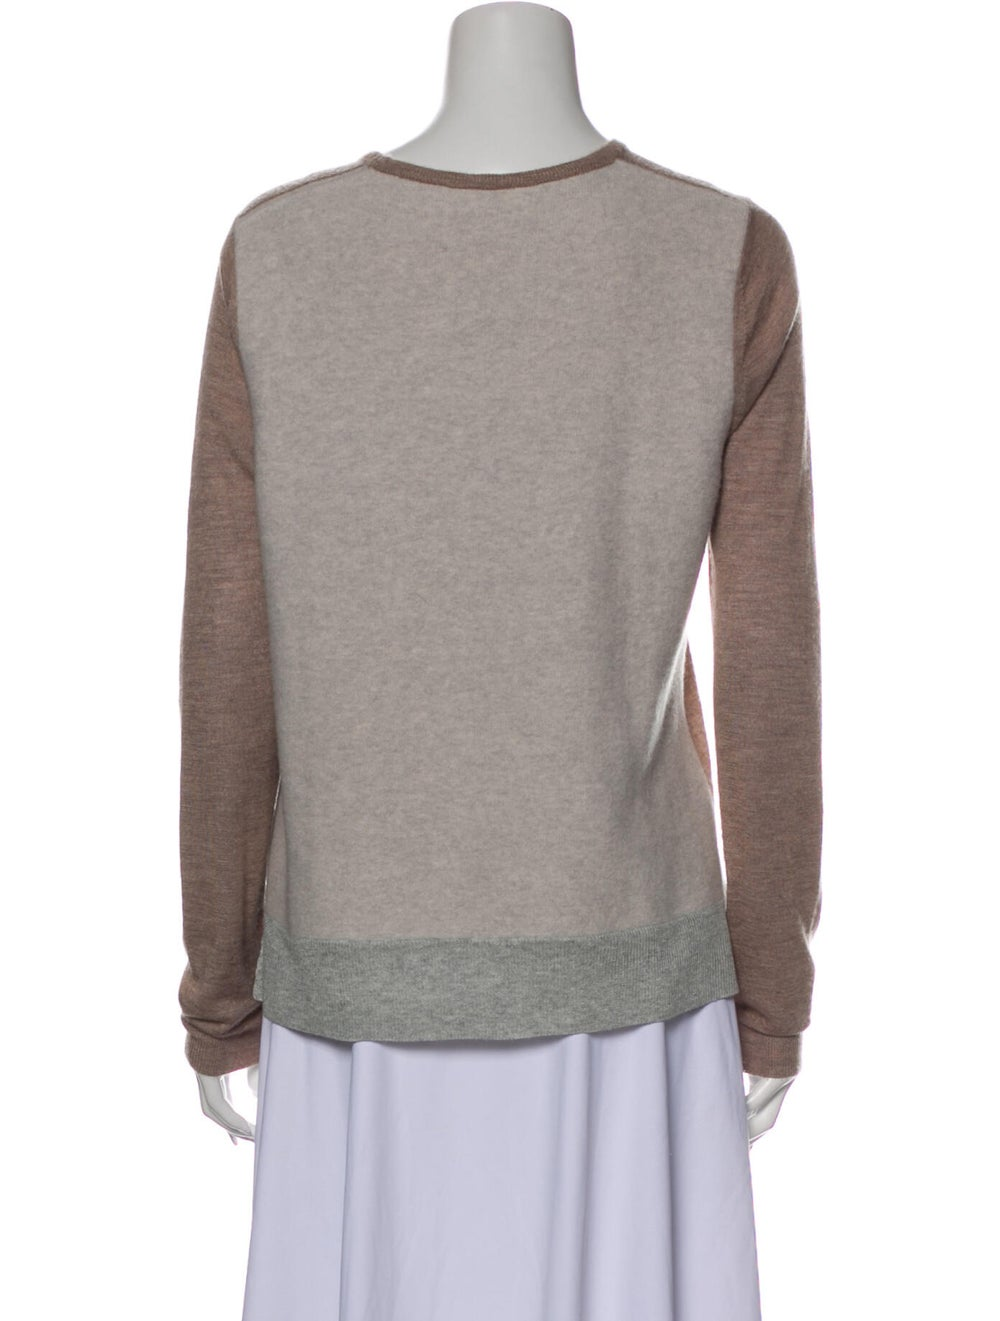 J Brand Crew Neck Sweater - image 3